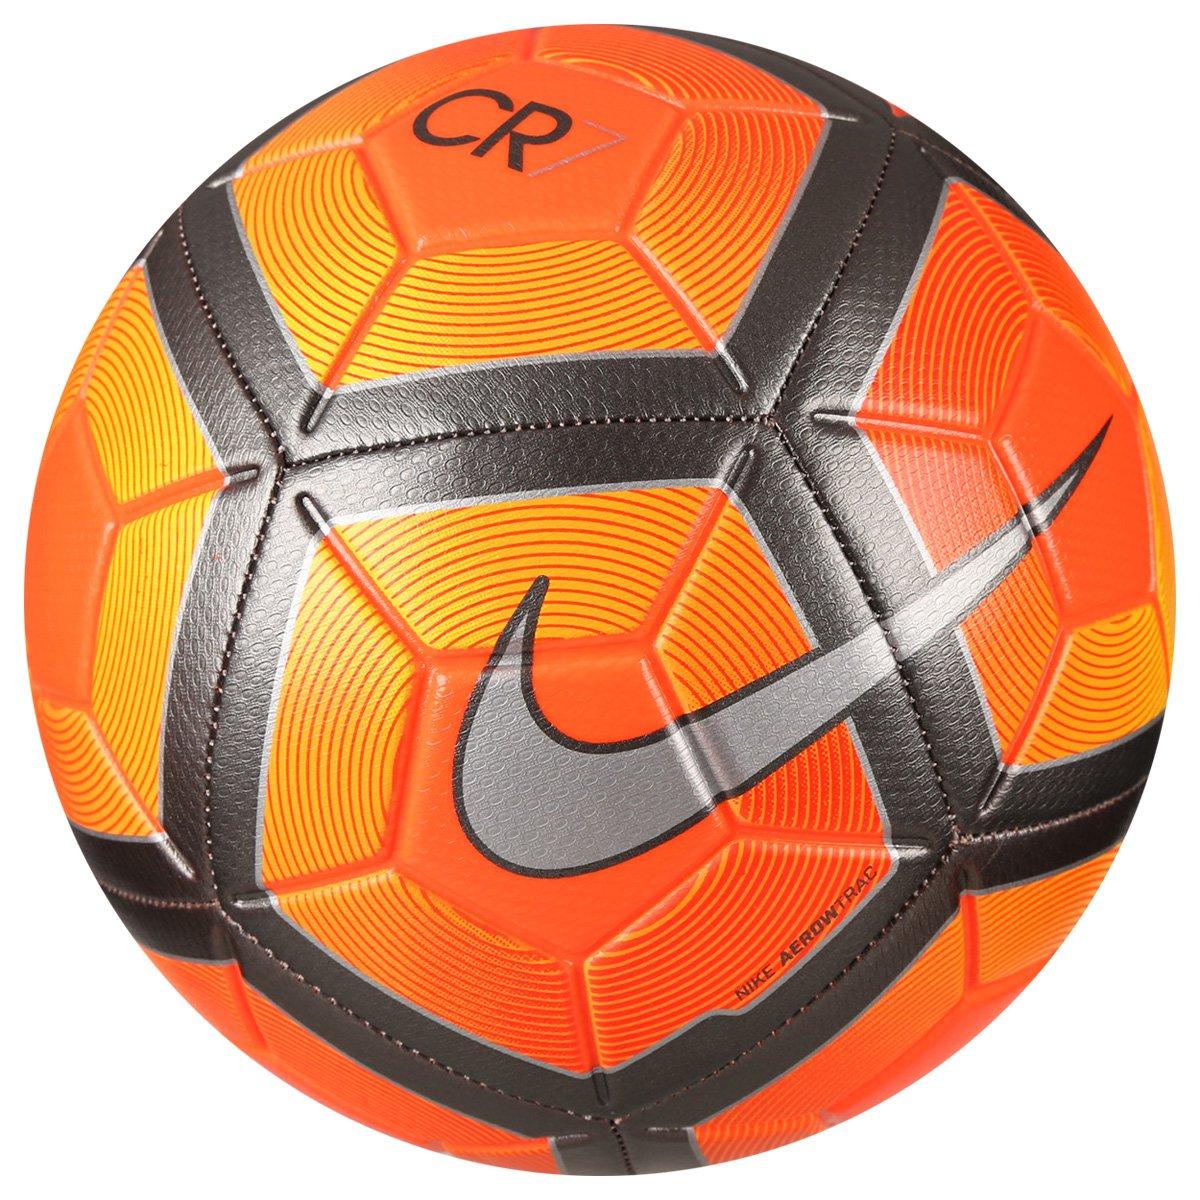 Bola Futebol Campo Nike CR7 Prestige Aerowtrac - Compre Agora  893b185fee721